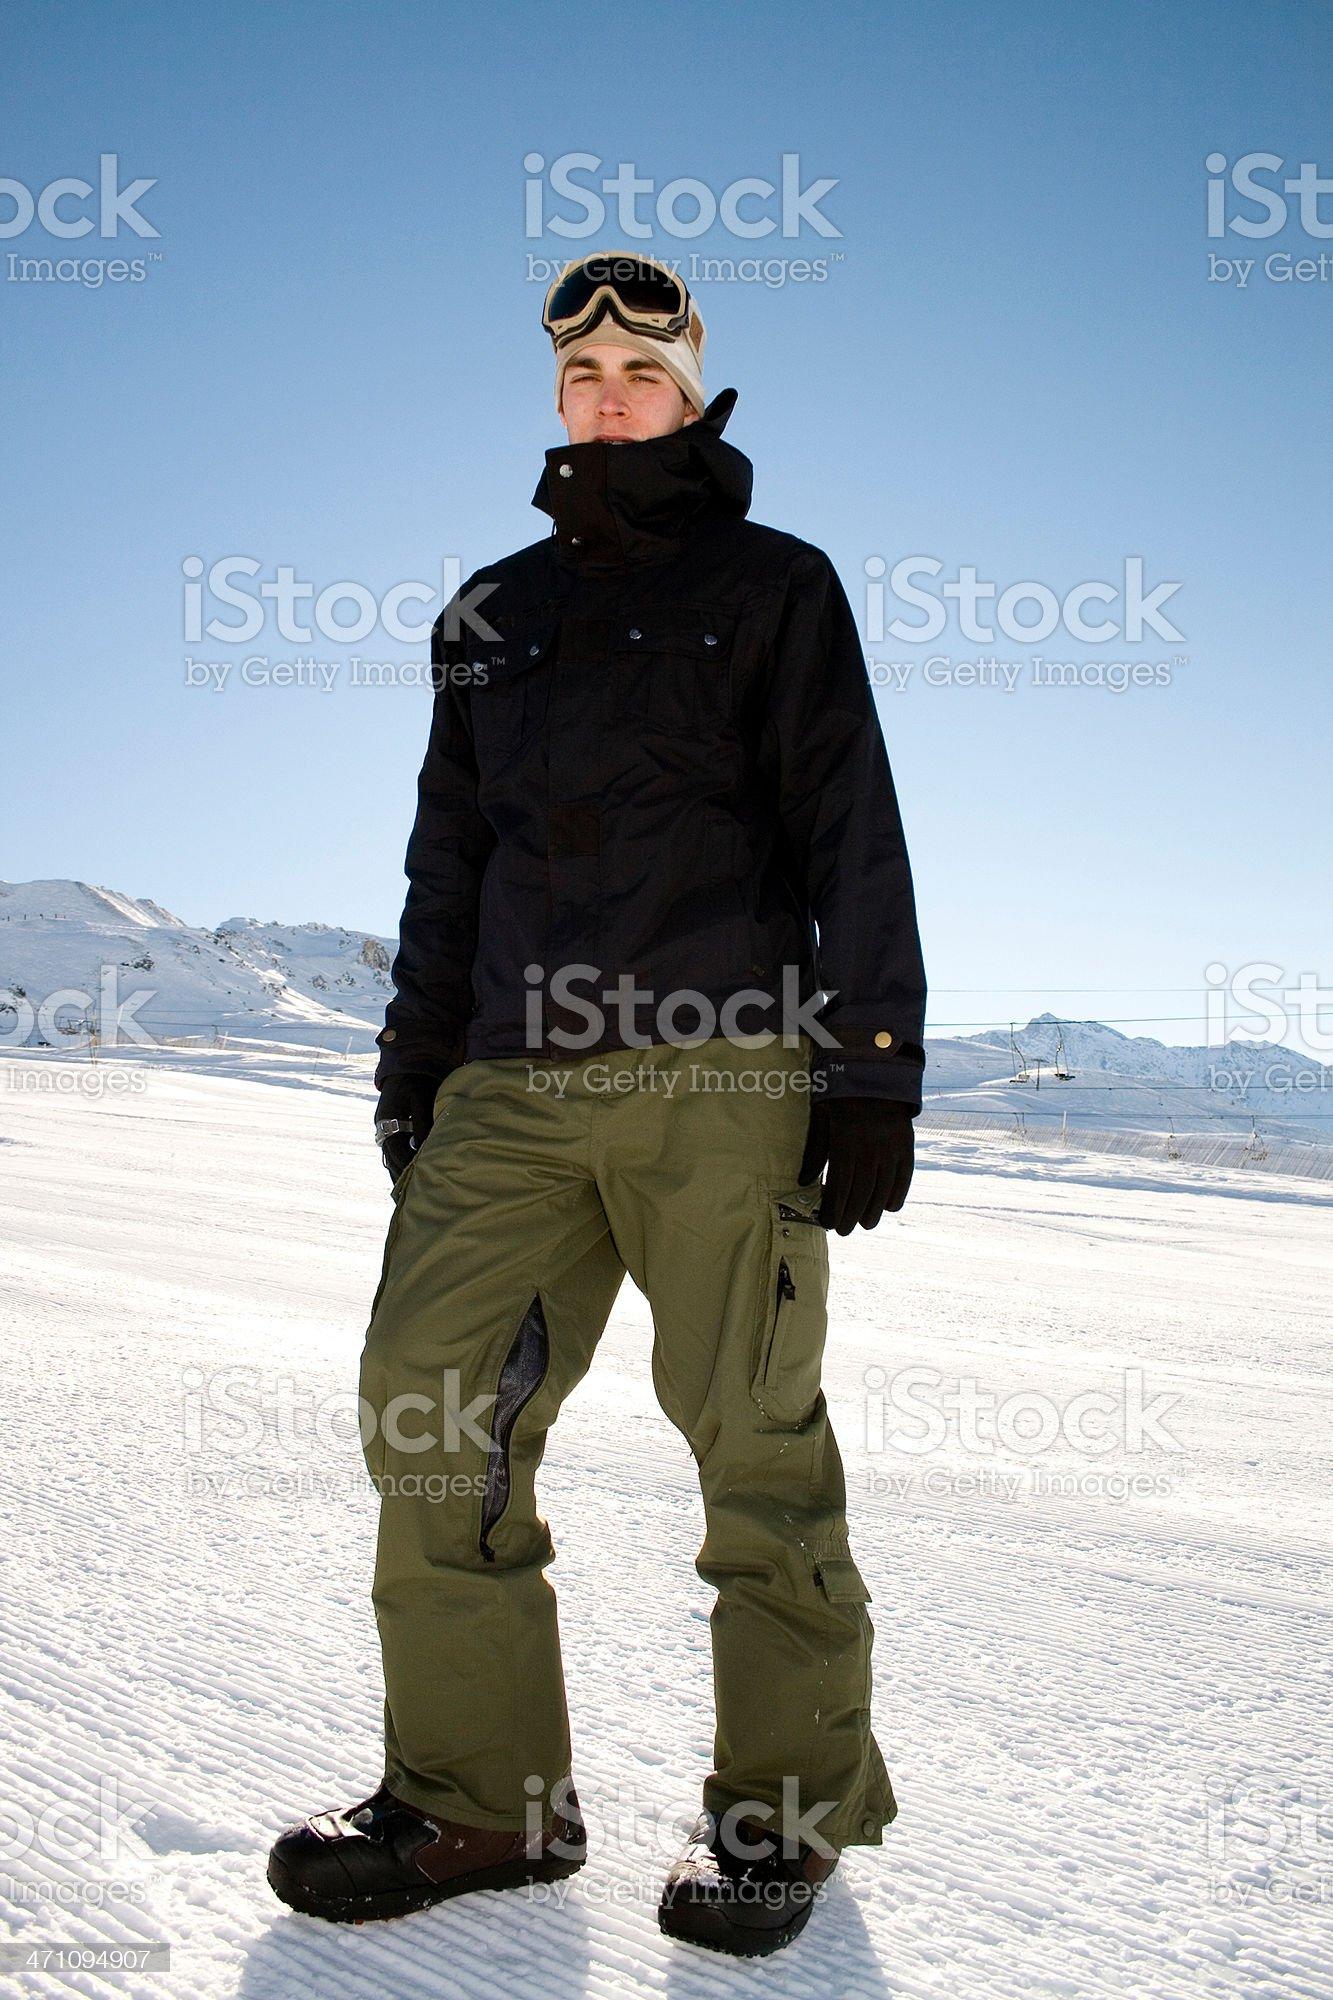 Snow Style royalty-free stock photo